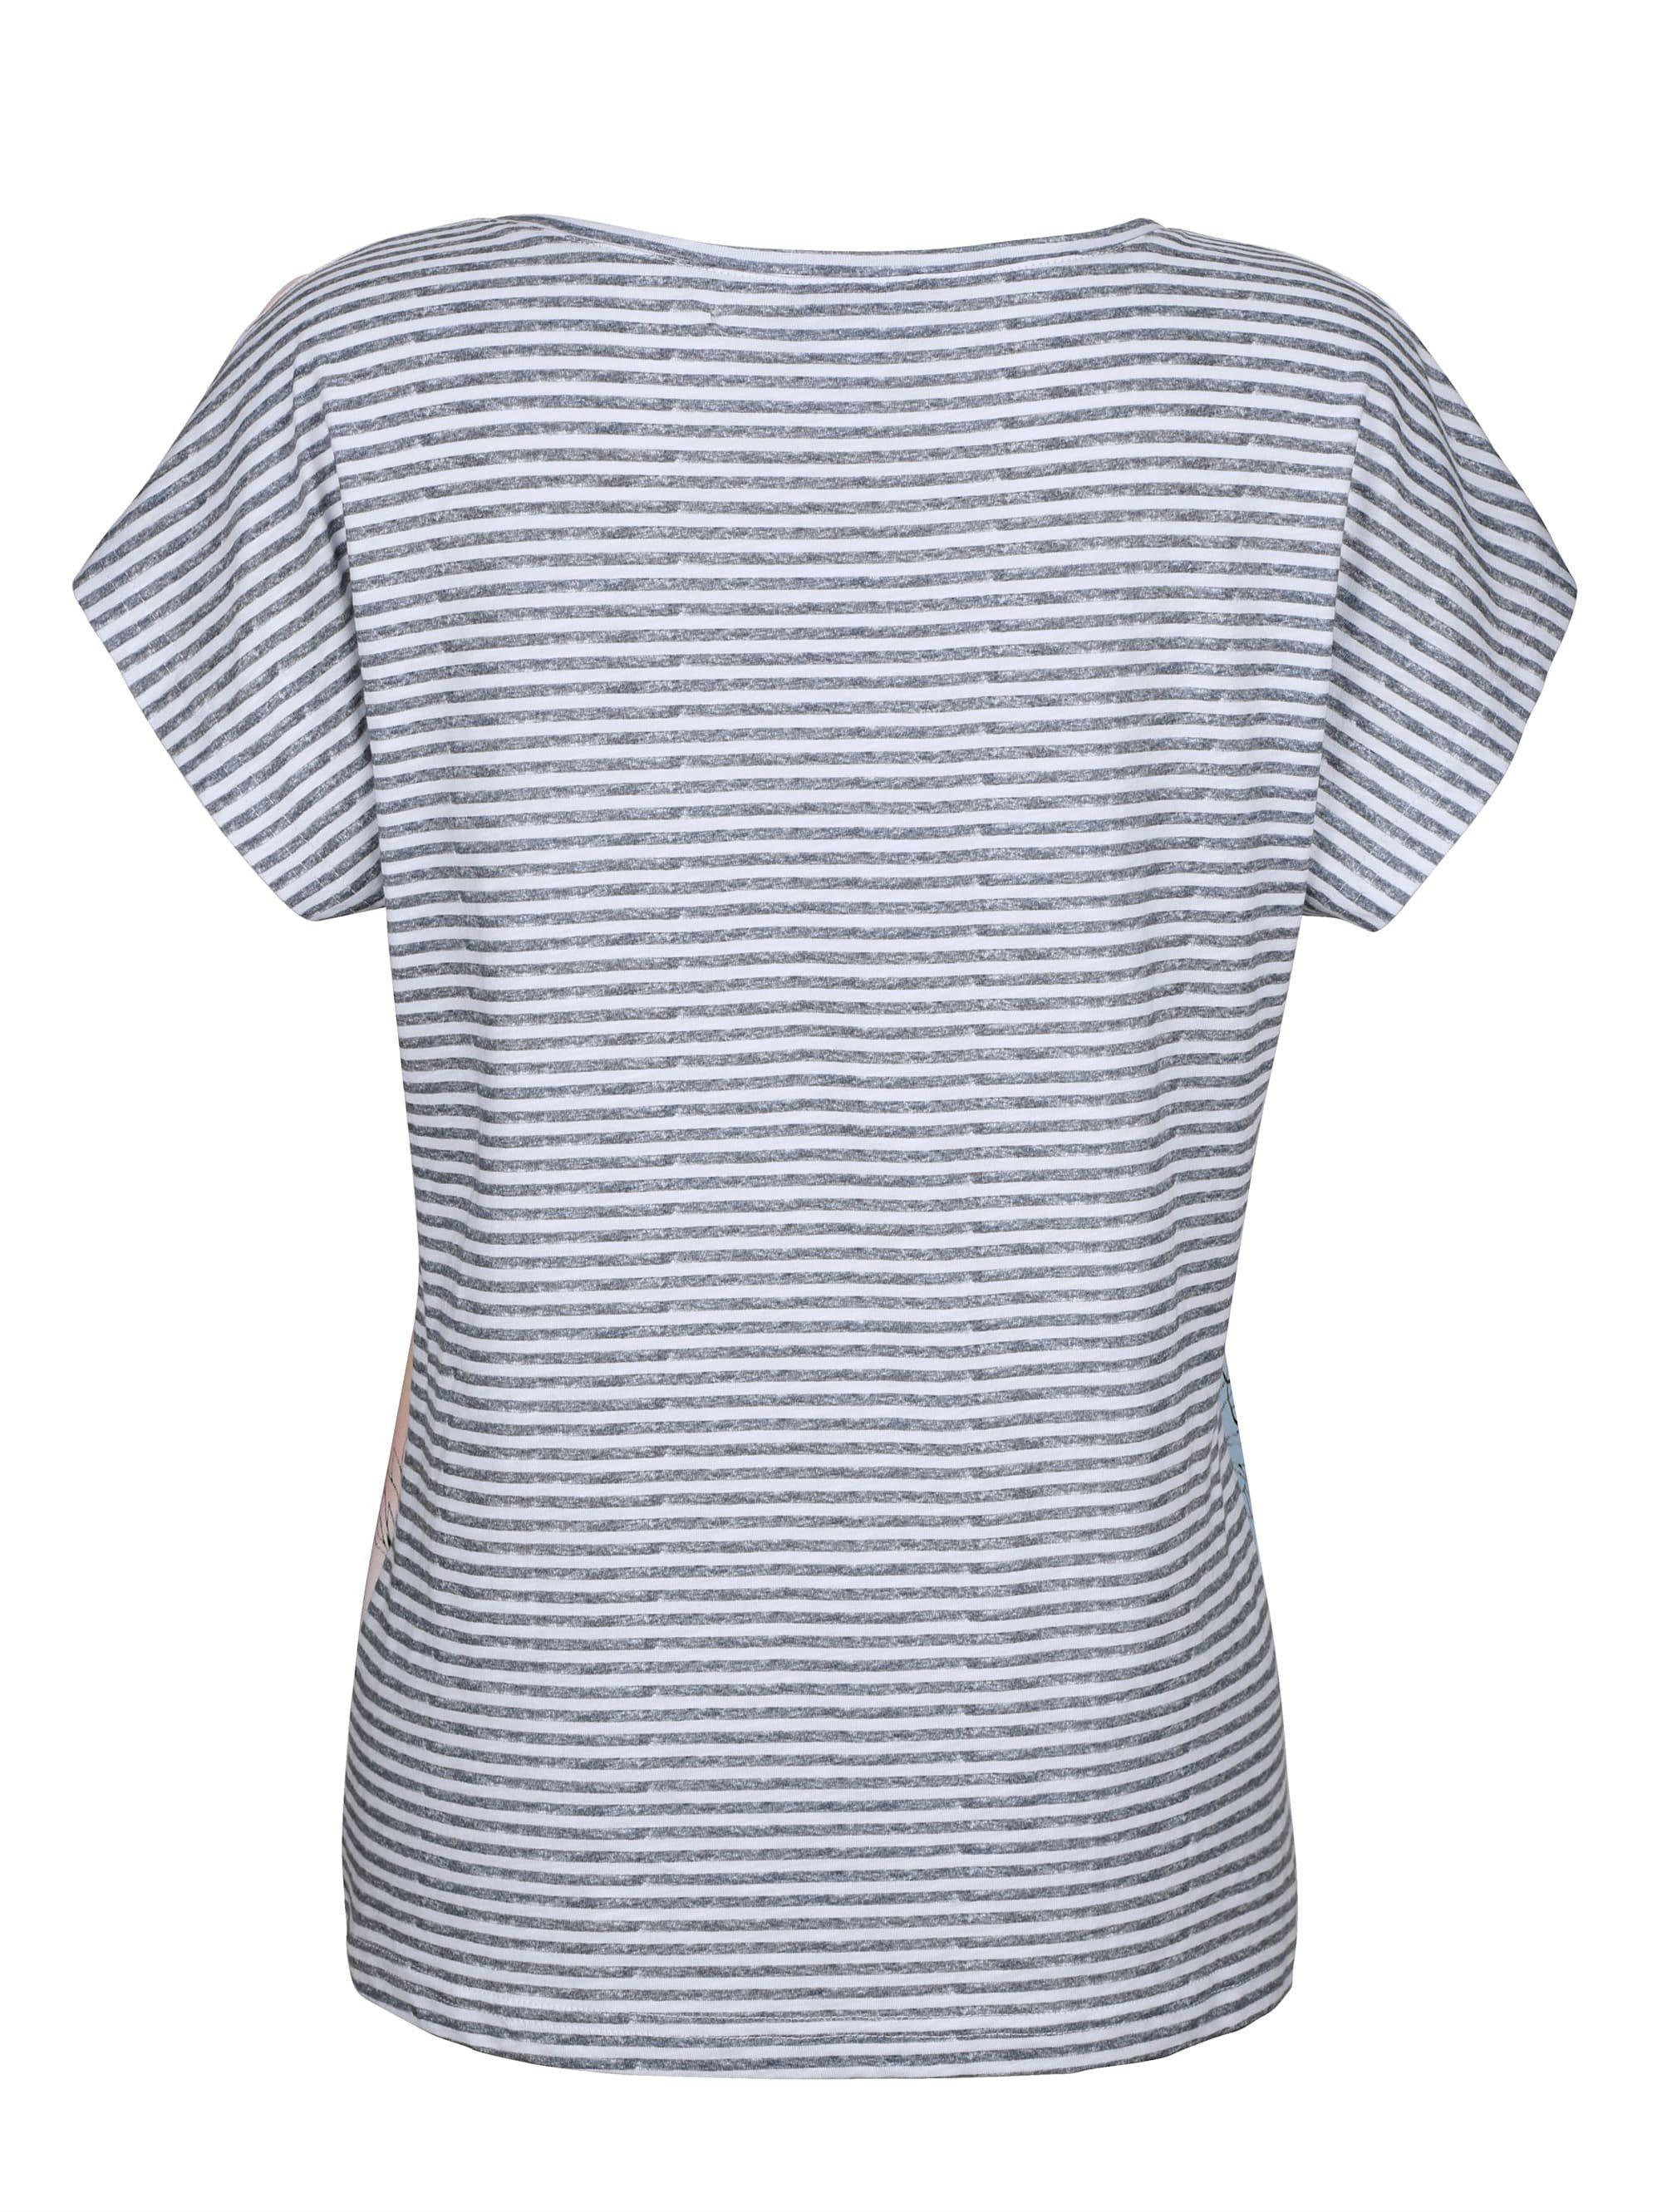 Dress In Shirt im Materialmixqualität, Mit Vikose rWV7nw